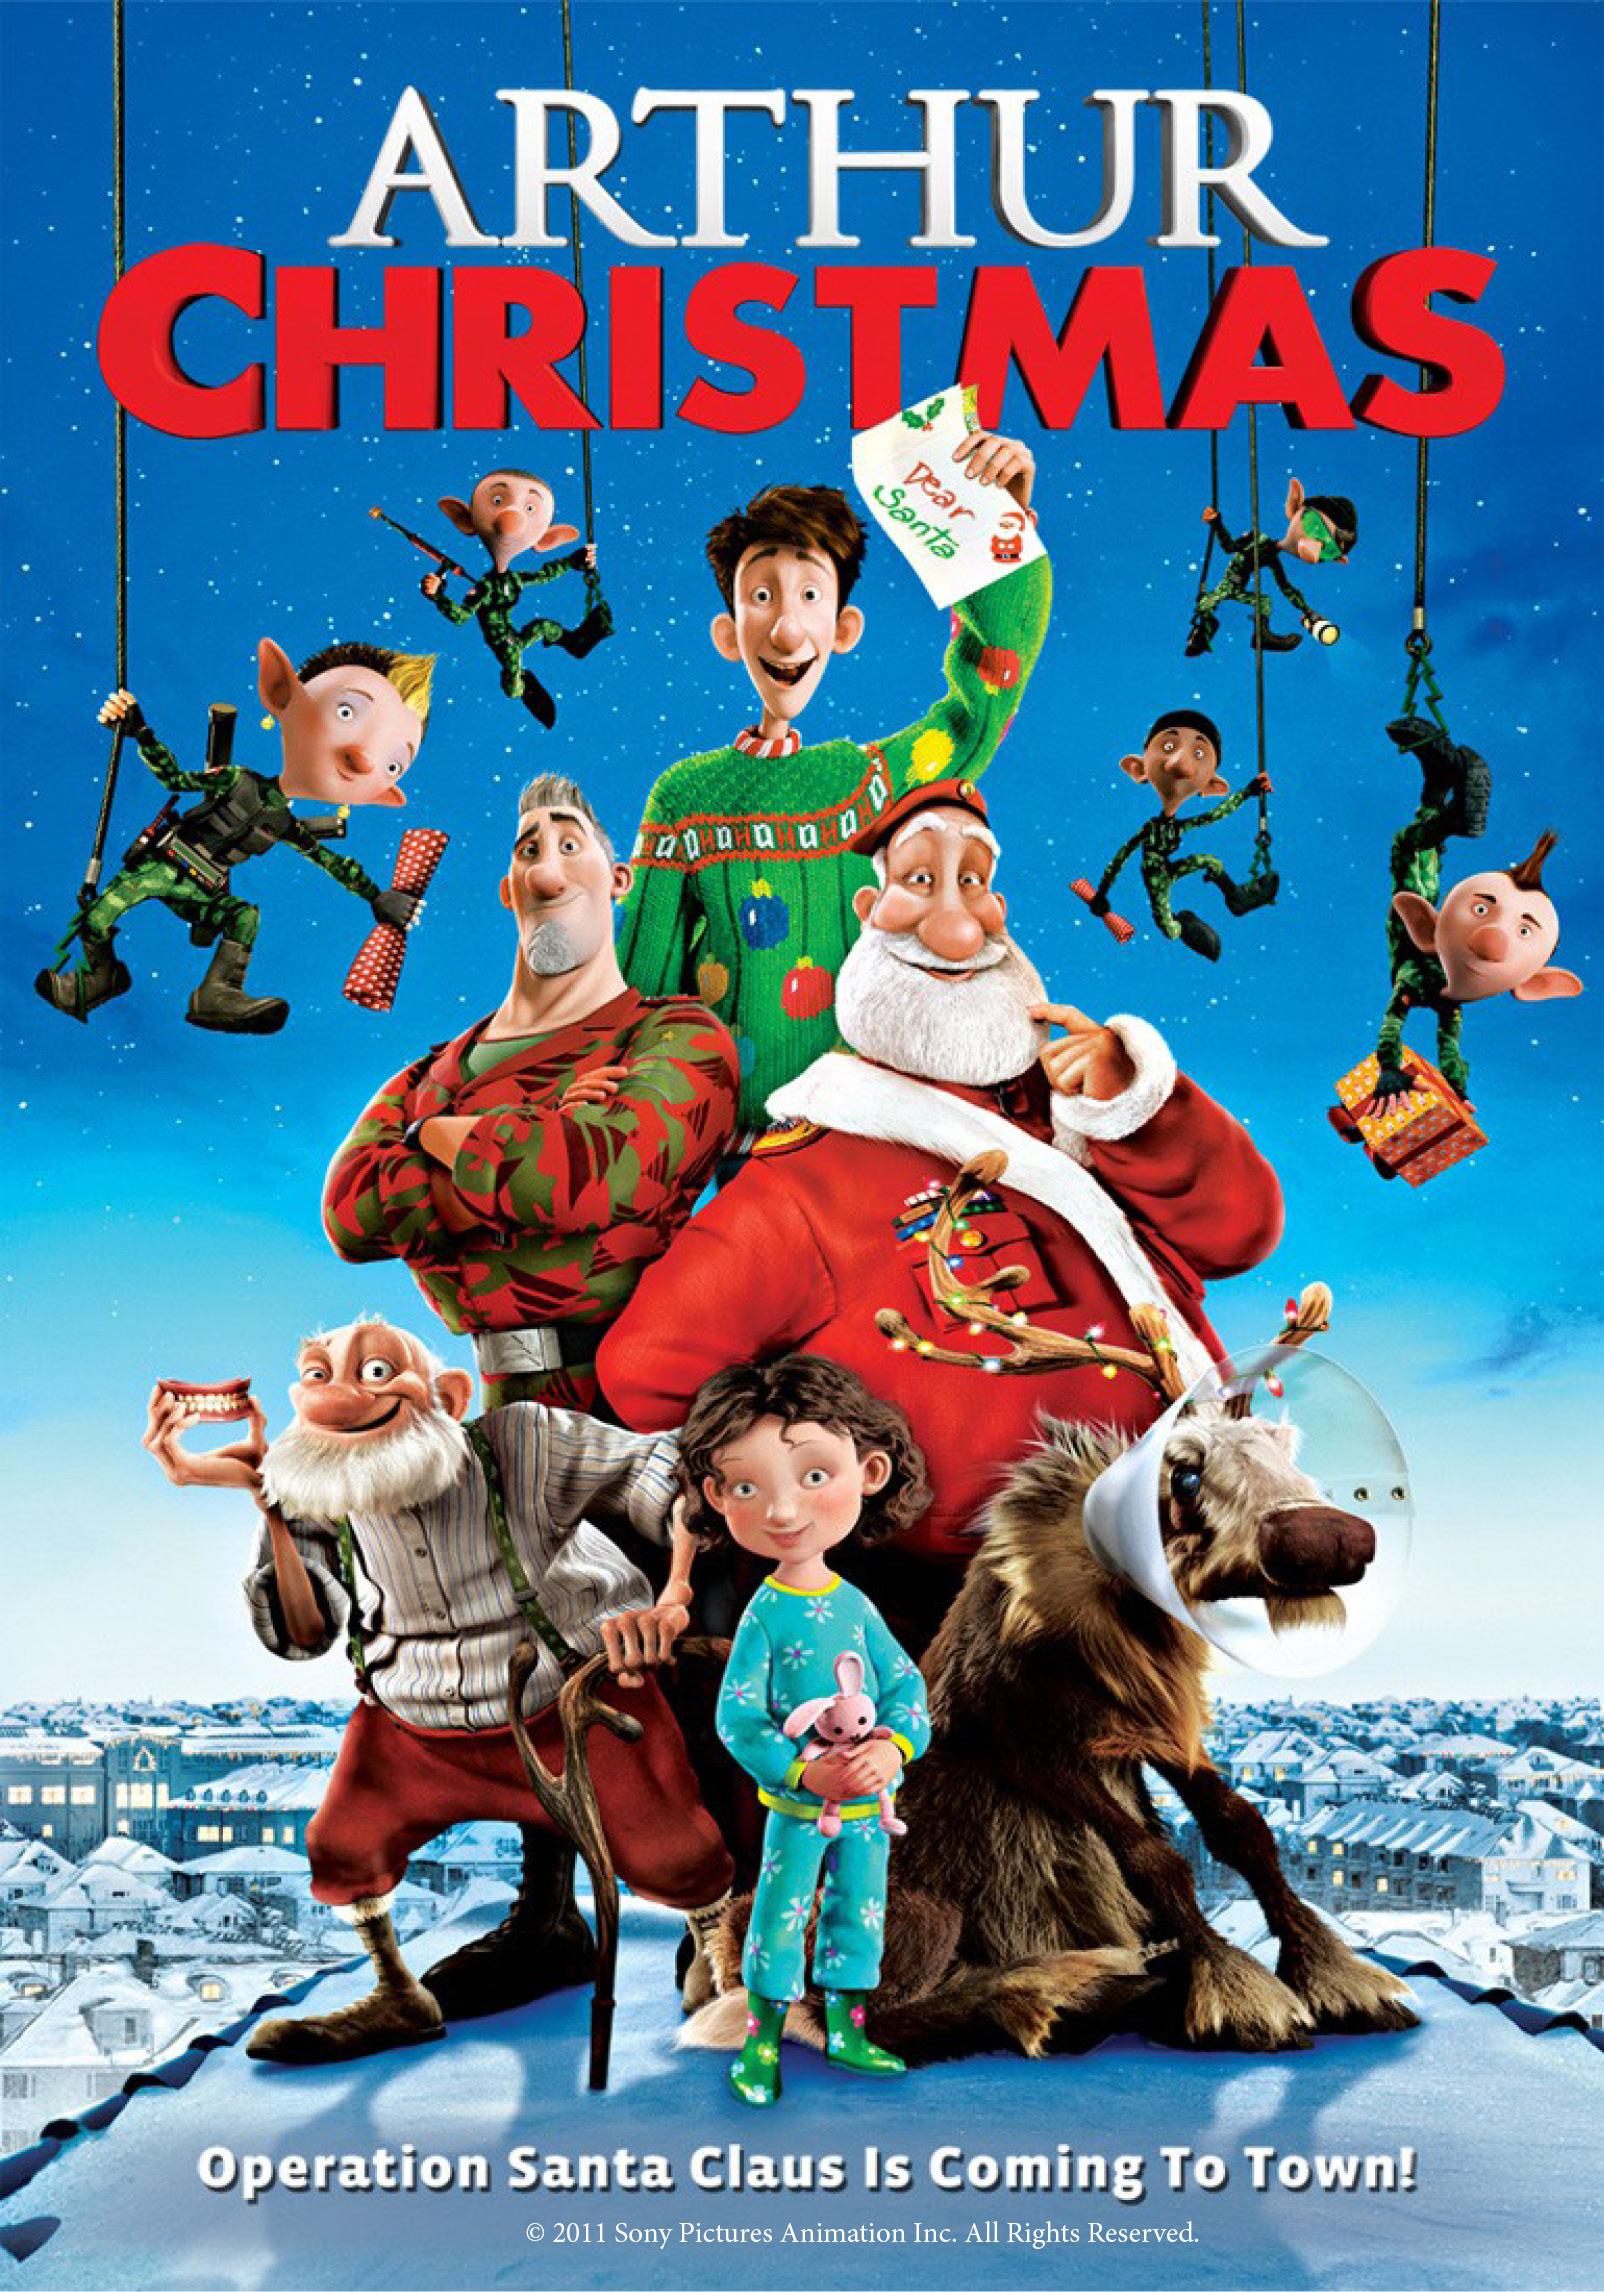 ARTHUR CHRISTMAS - Filmbankmedia